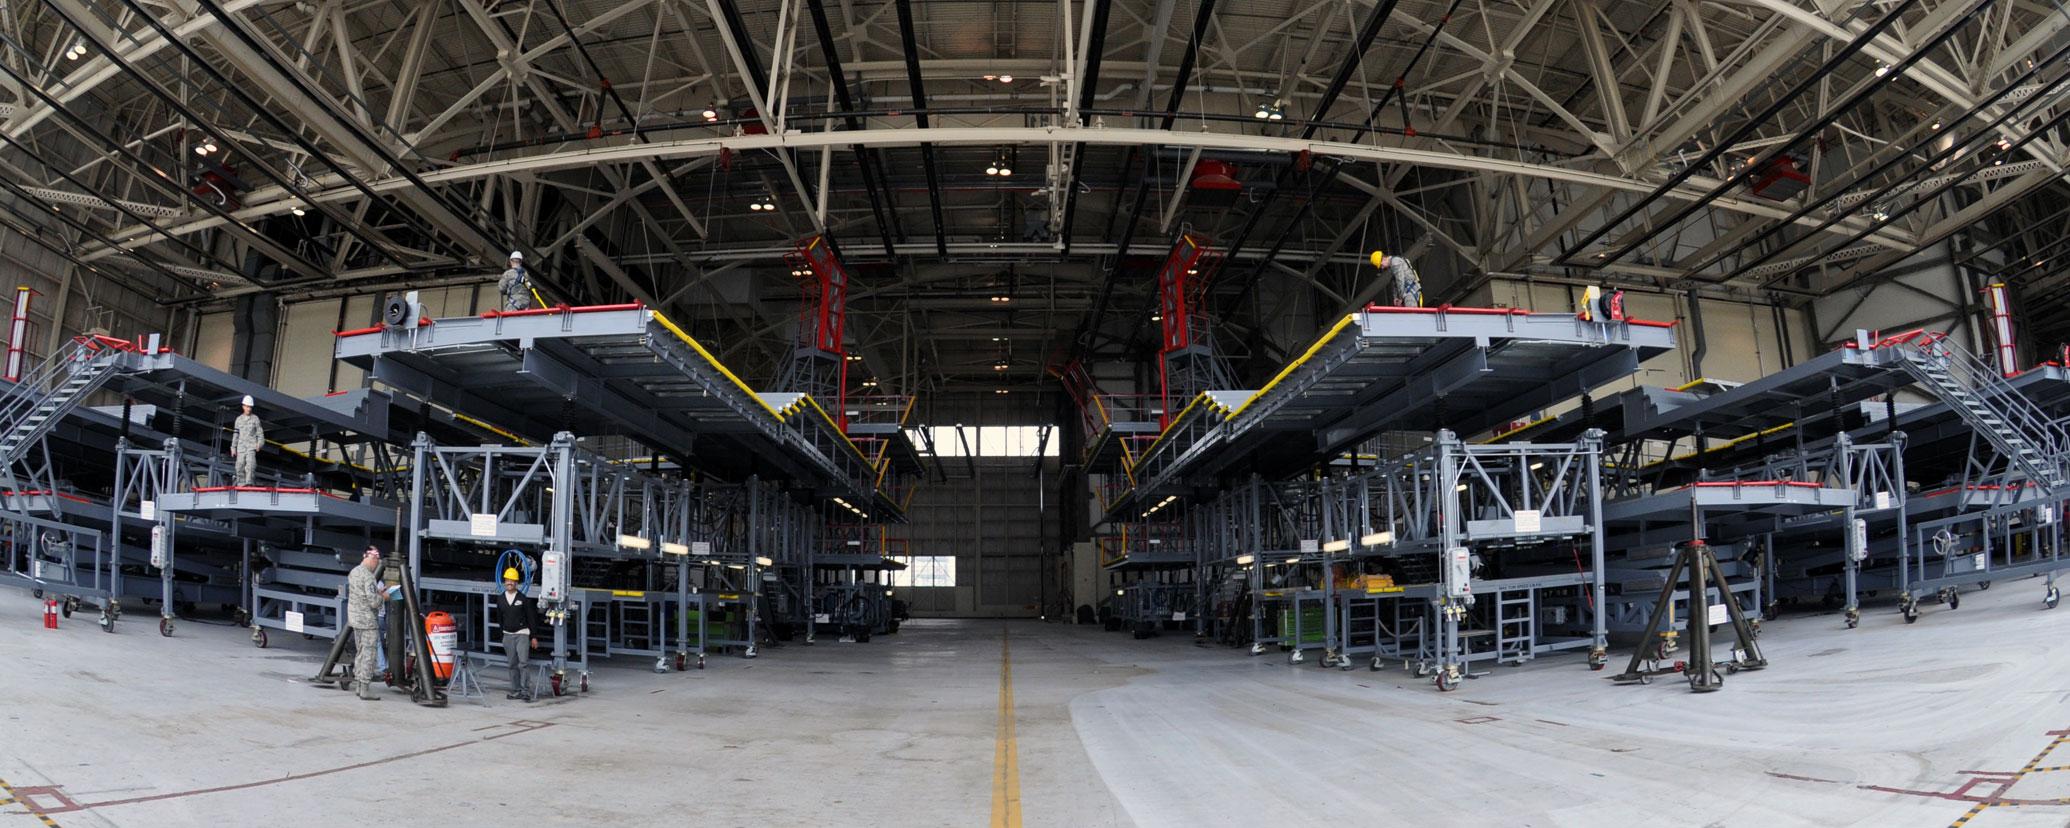 C 5a Hangar Westover Afb Ma Caddell Construction Co Llc